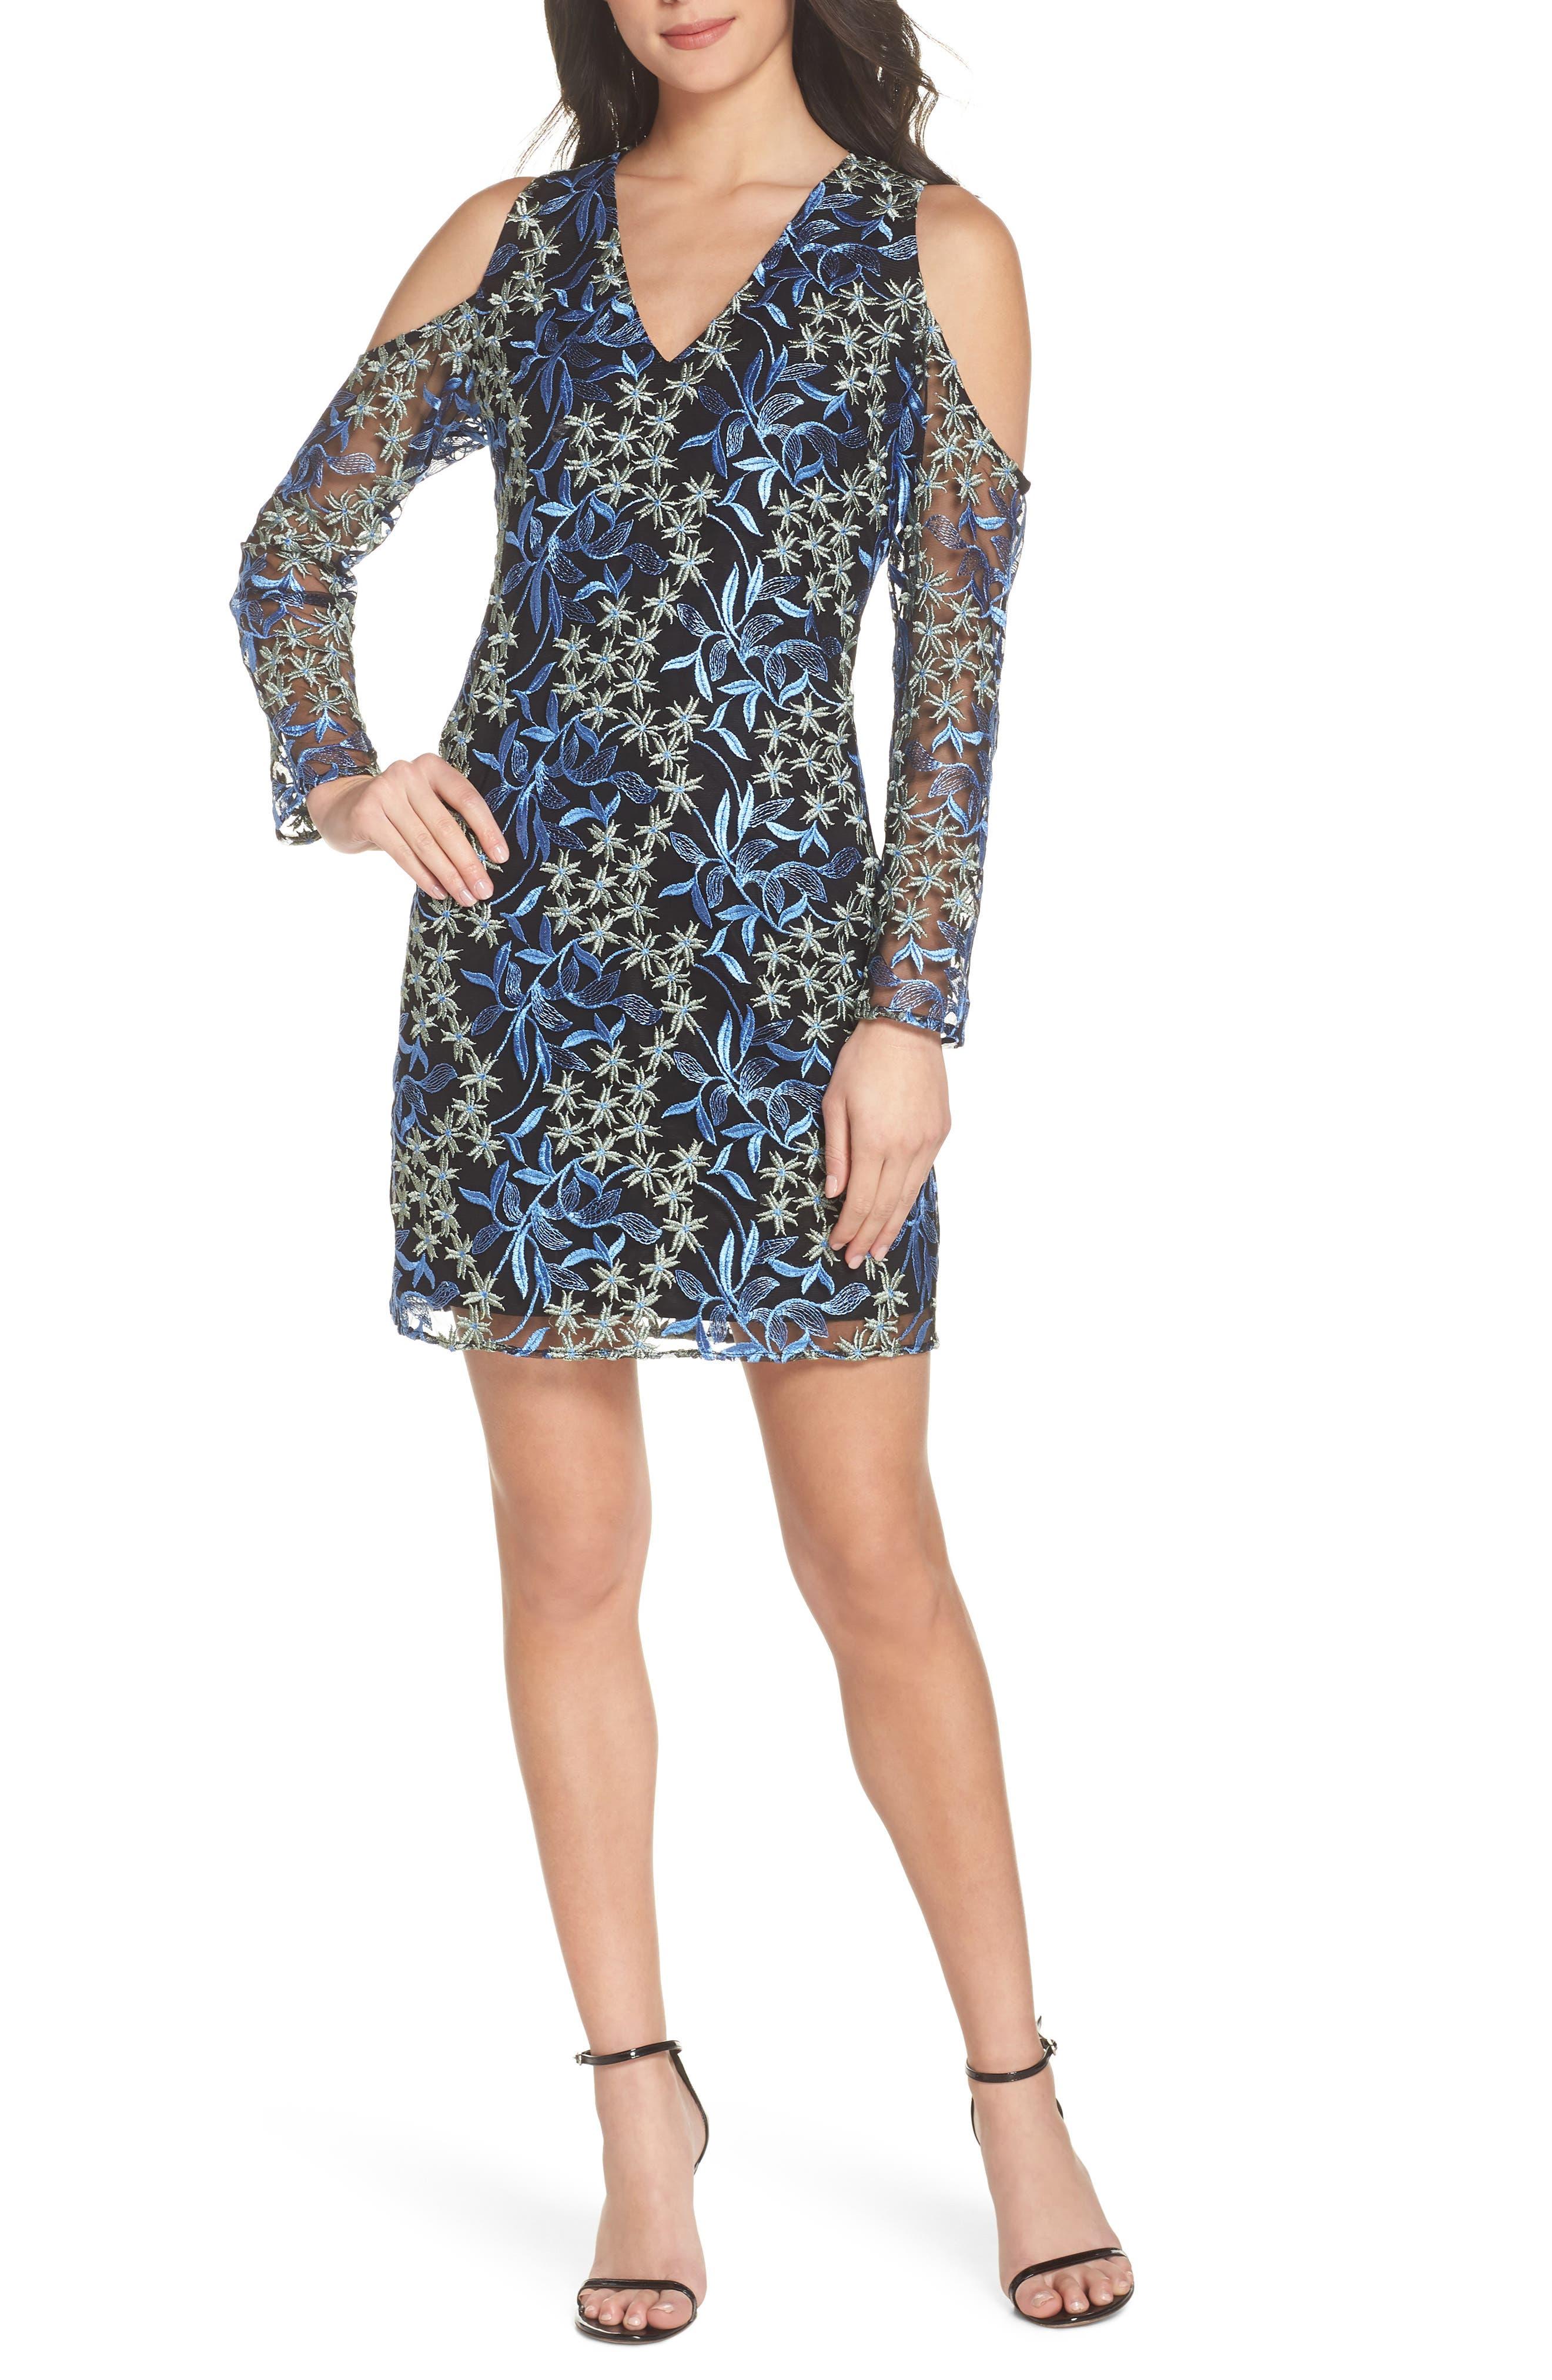 Floral Embroidered Cold Shoulder Dress,                             Main thumbnail 1, color,                             Blue/ Green